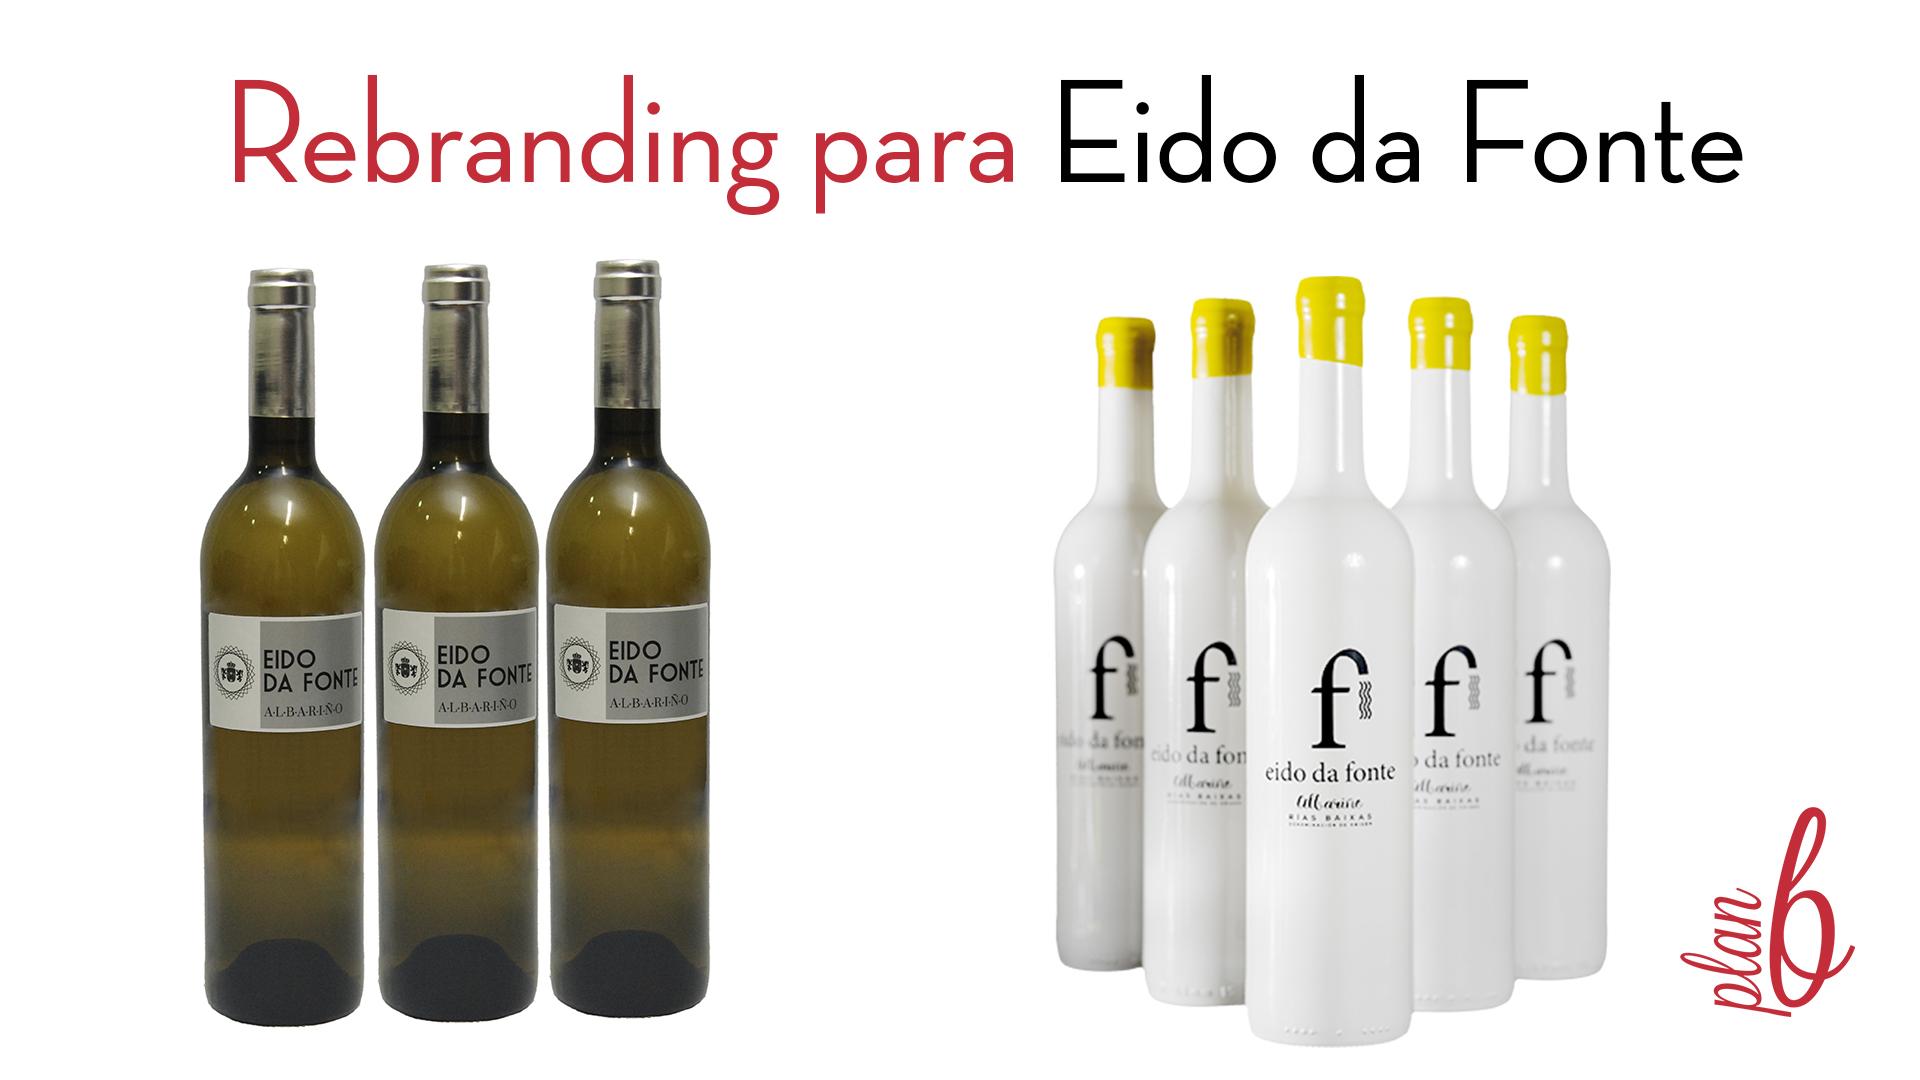 rebranding-planb-para-eido-da-fonte